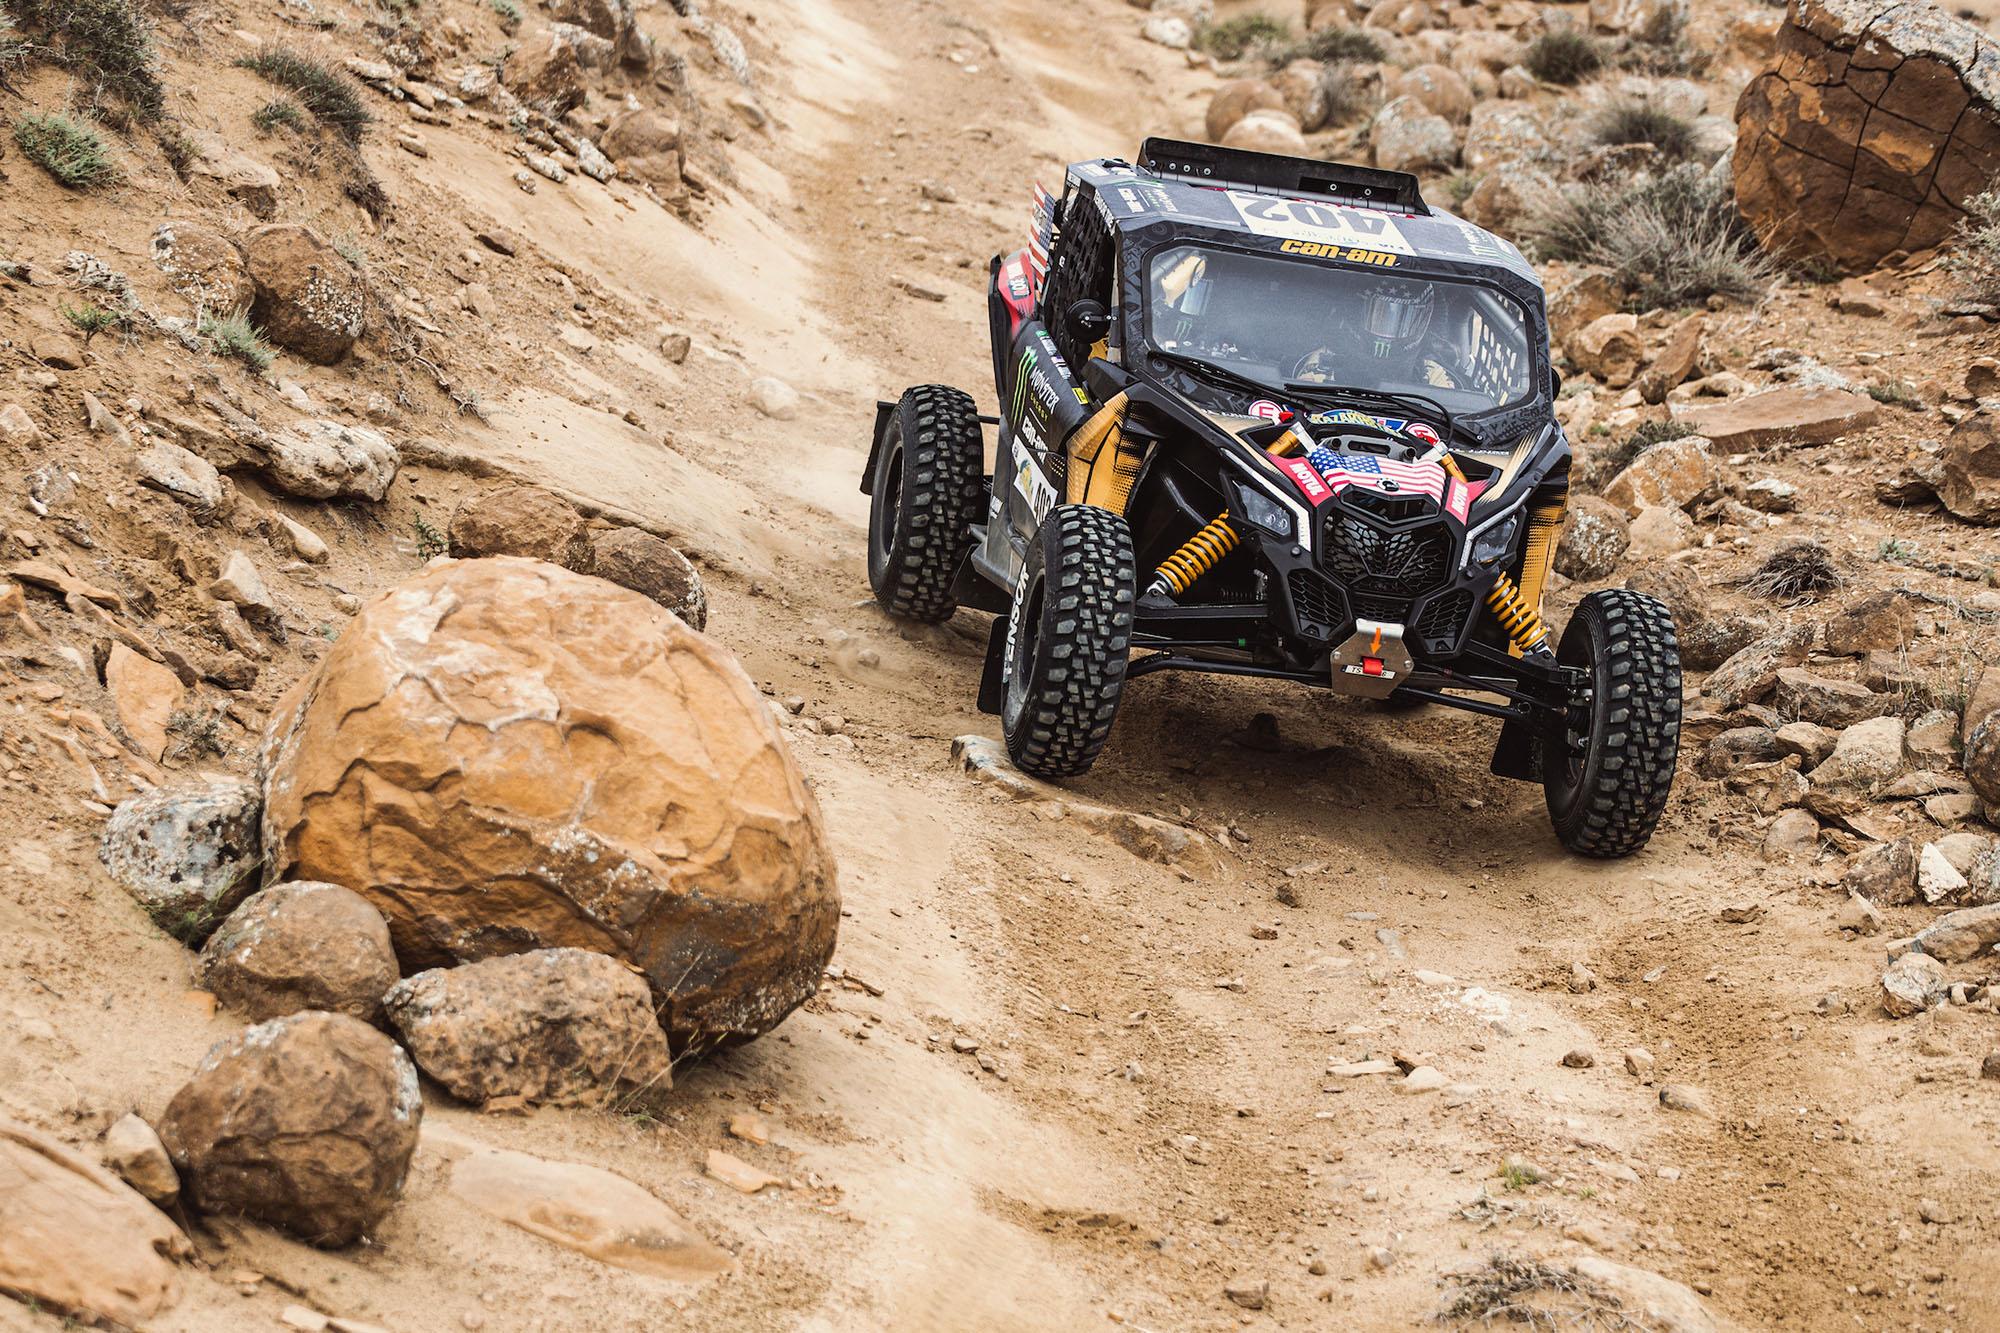 2021-Rally-Kazakhstan-AJ-Jones-S4-F59I6278.jpg